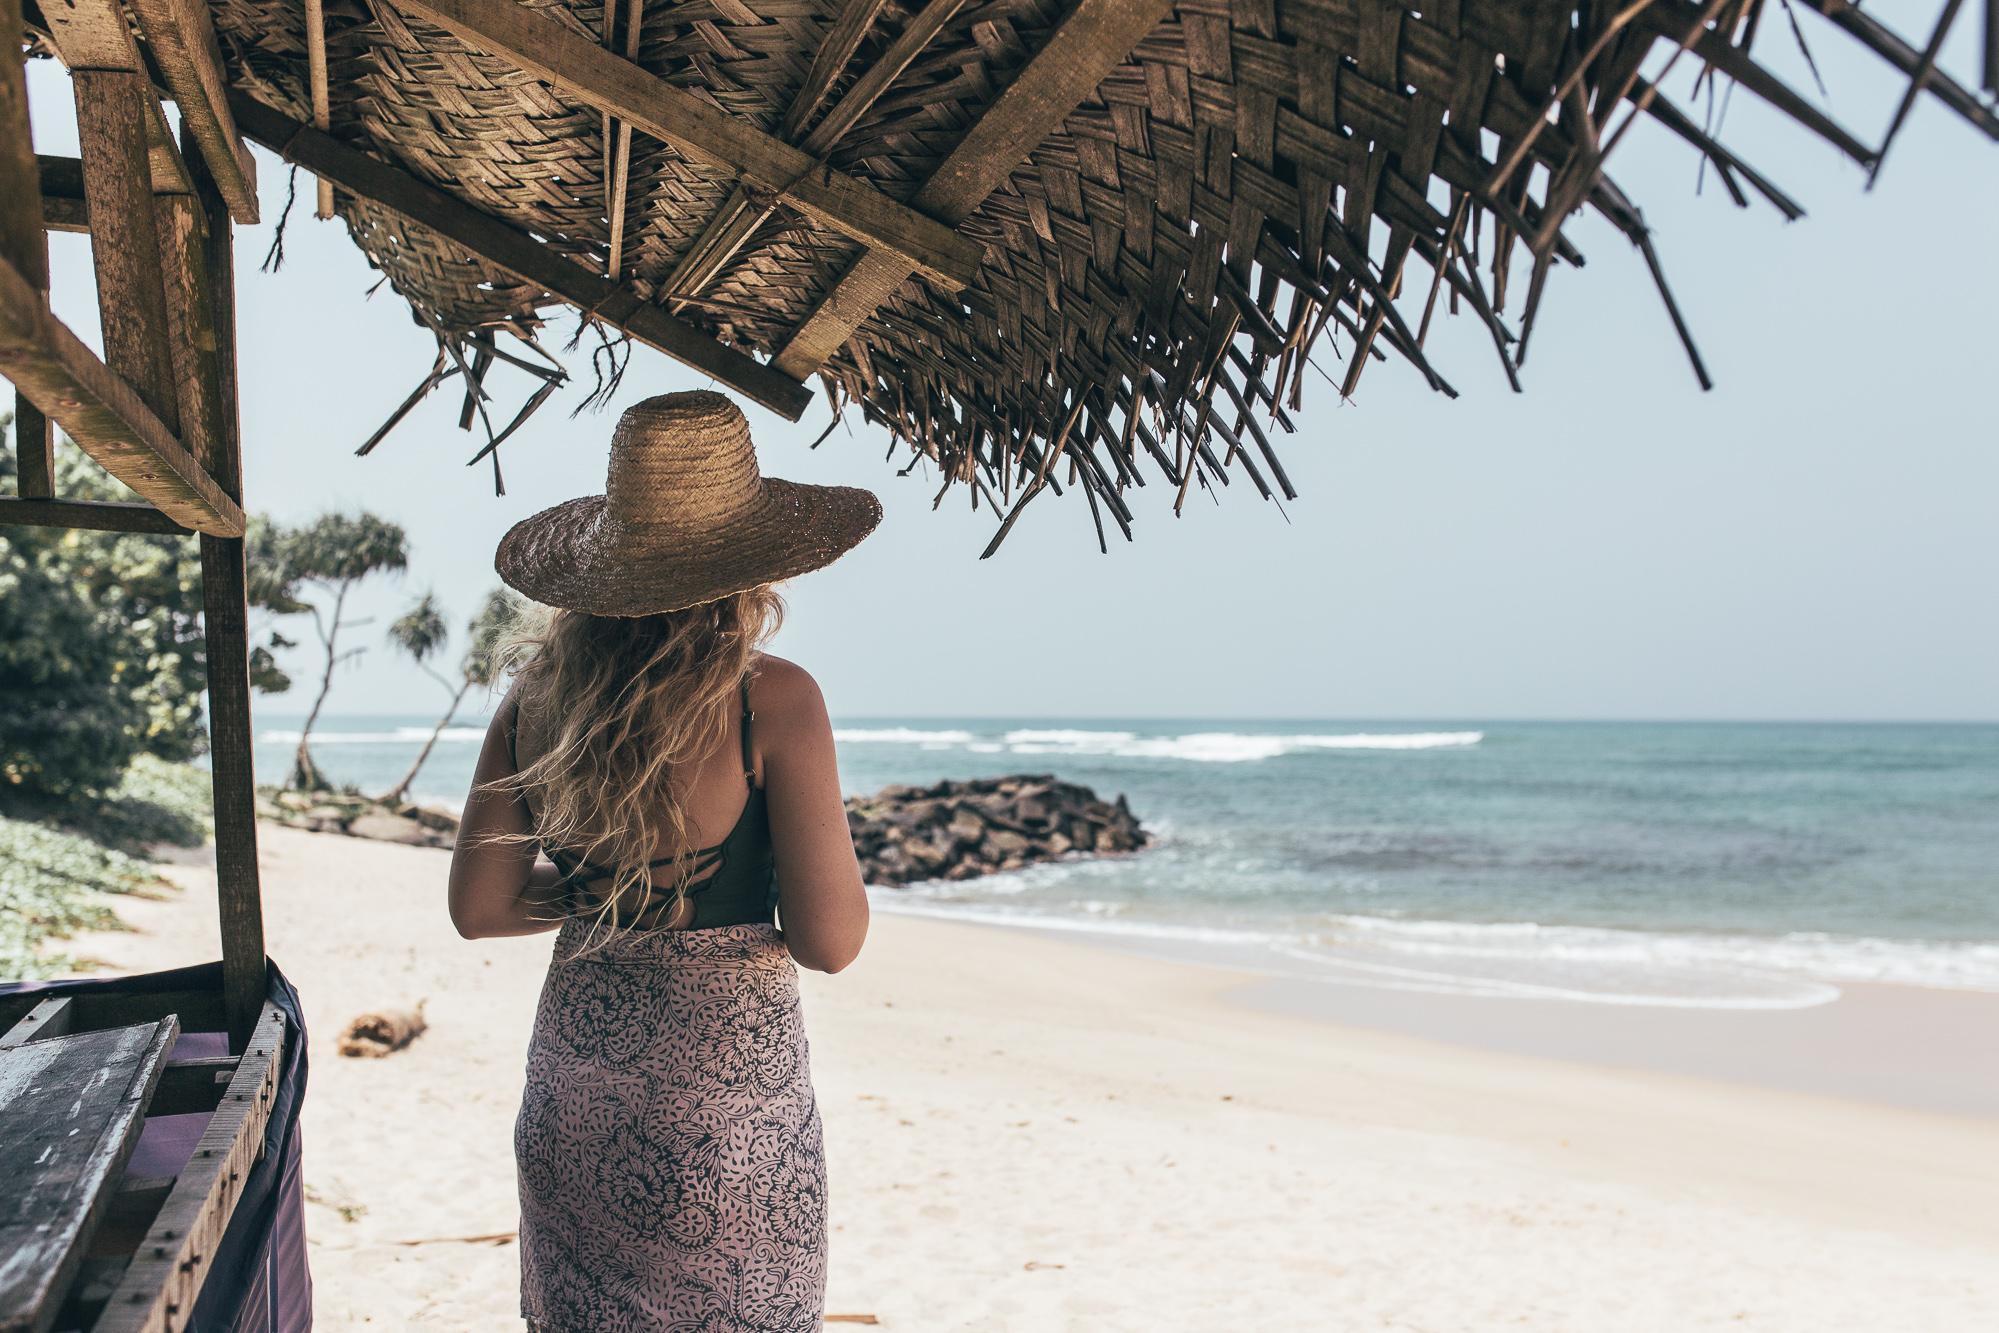 Girls living outside the rules of society - Linn Lundgren | Sunshine stories | Ceylon Sliders |Sri Lanka | Unique Bohemian Beach Items from around the world | Salty Boho Boutique | www.saltyboho.com